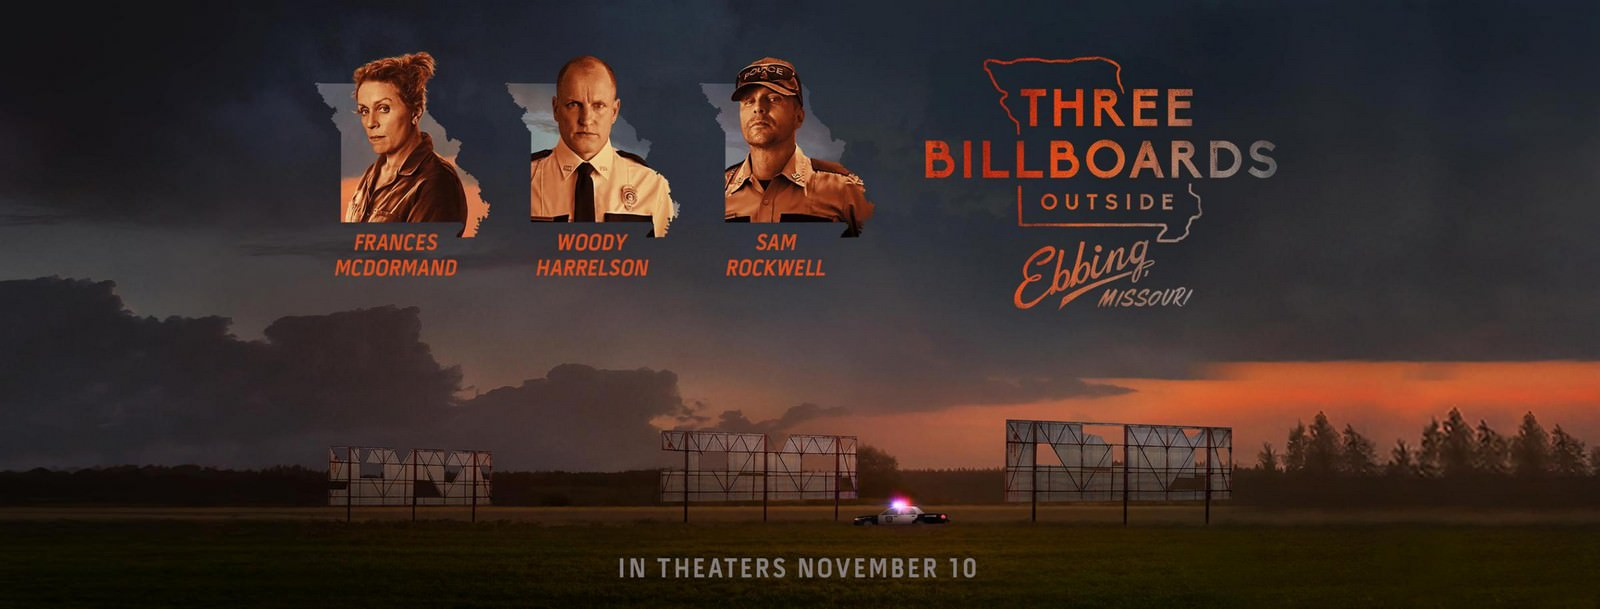 Movie, Three Billboards Outside Ebbing, Missouri(美國.英國) / 意外(台) / 廣告牌殺人事件(港) / 三块广告牌(網), 電影海報, 美國, 橫版